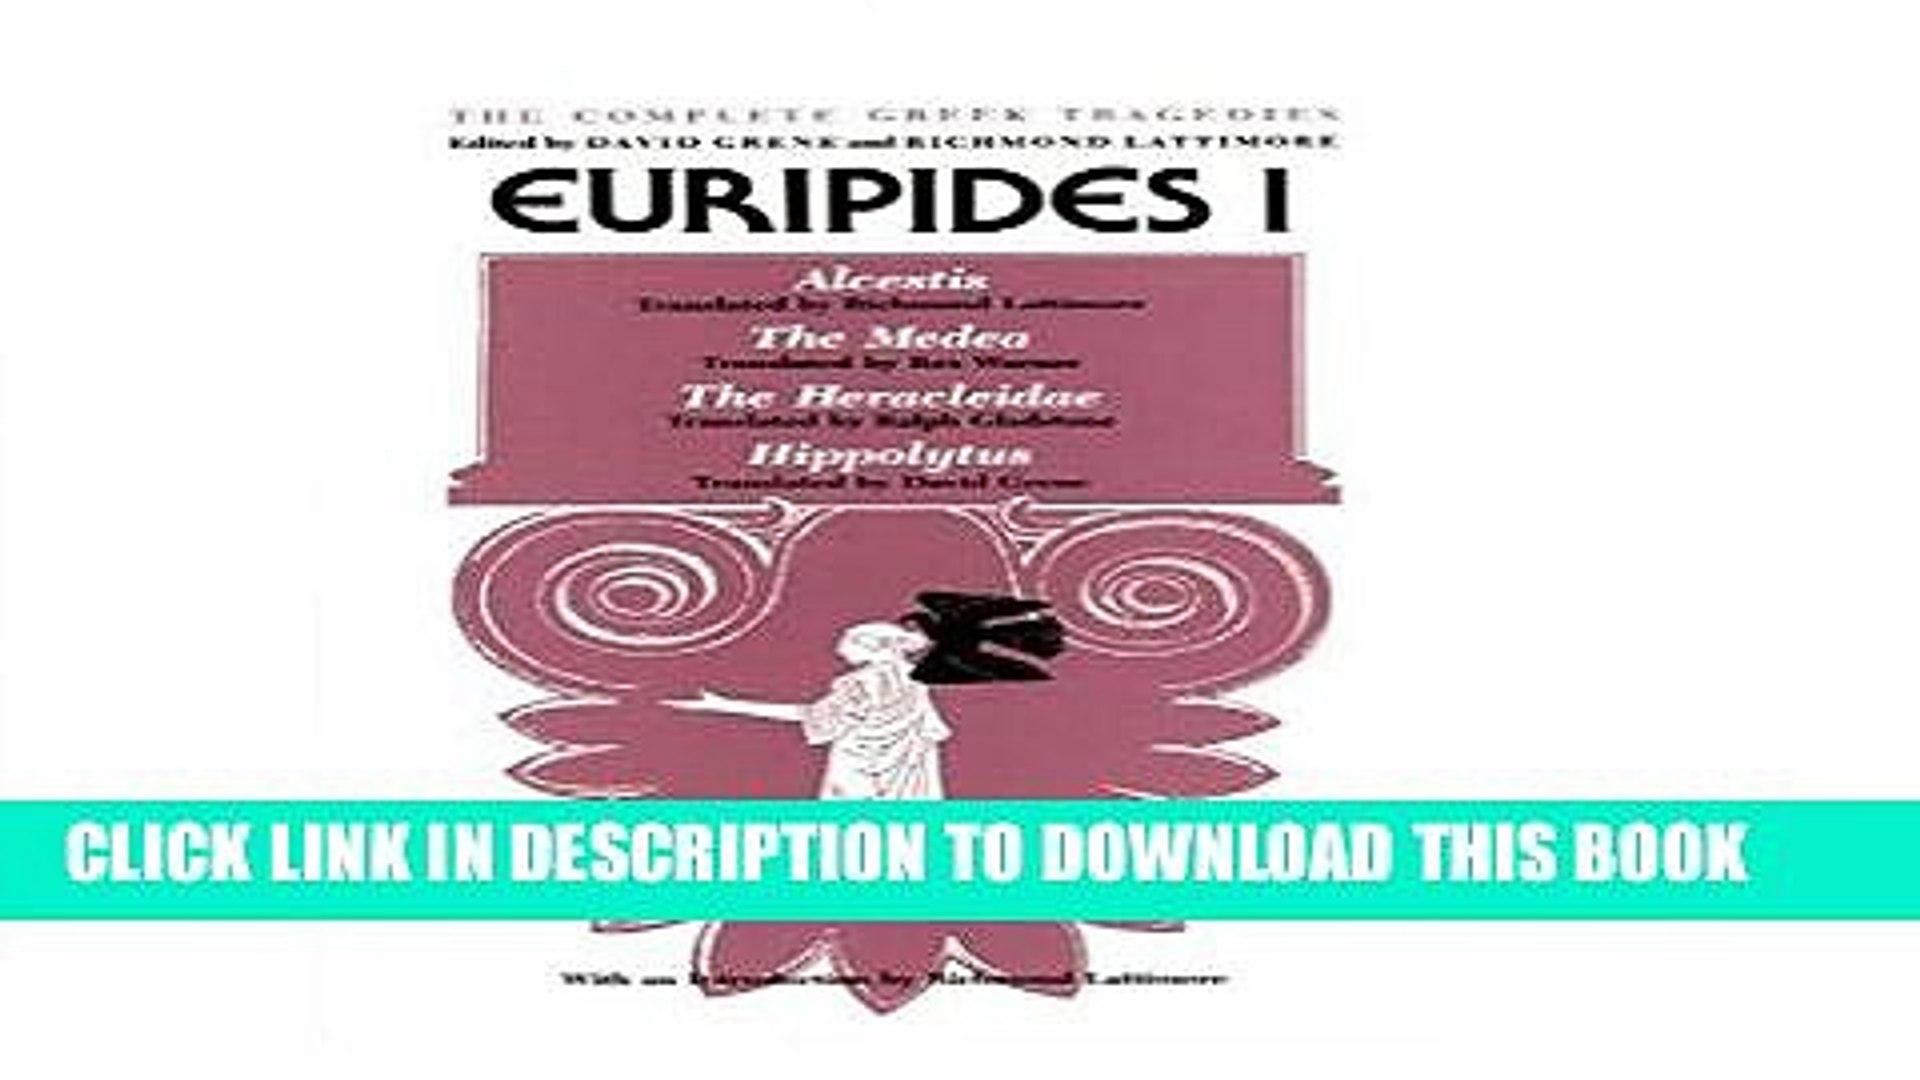 Ebook Euripides I: Alcestis, The Medea, The Heracleidae, Hippolytus (The Complete Greek Tragedies)